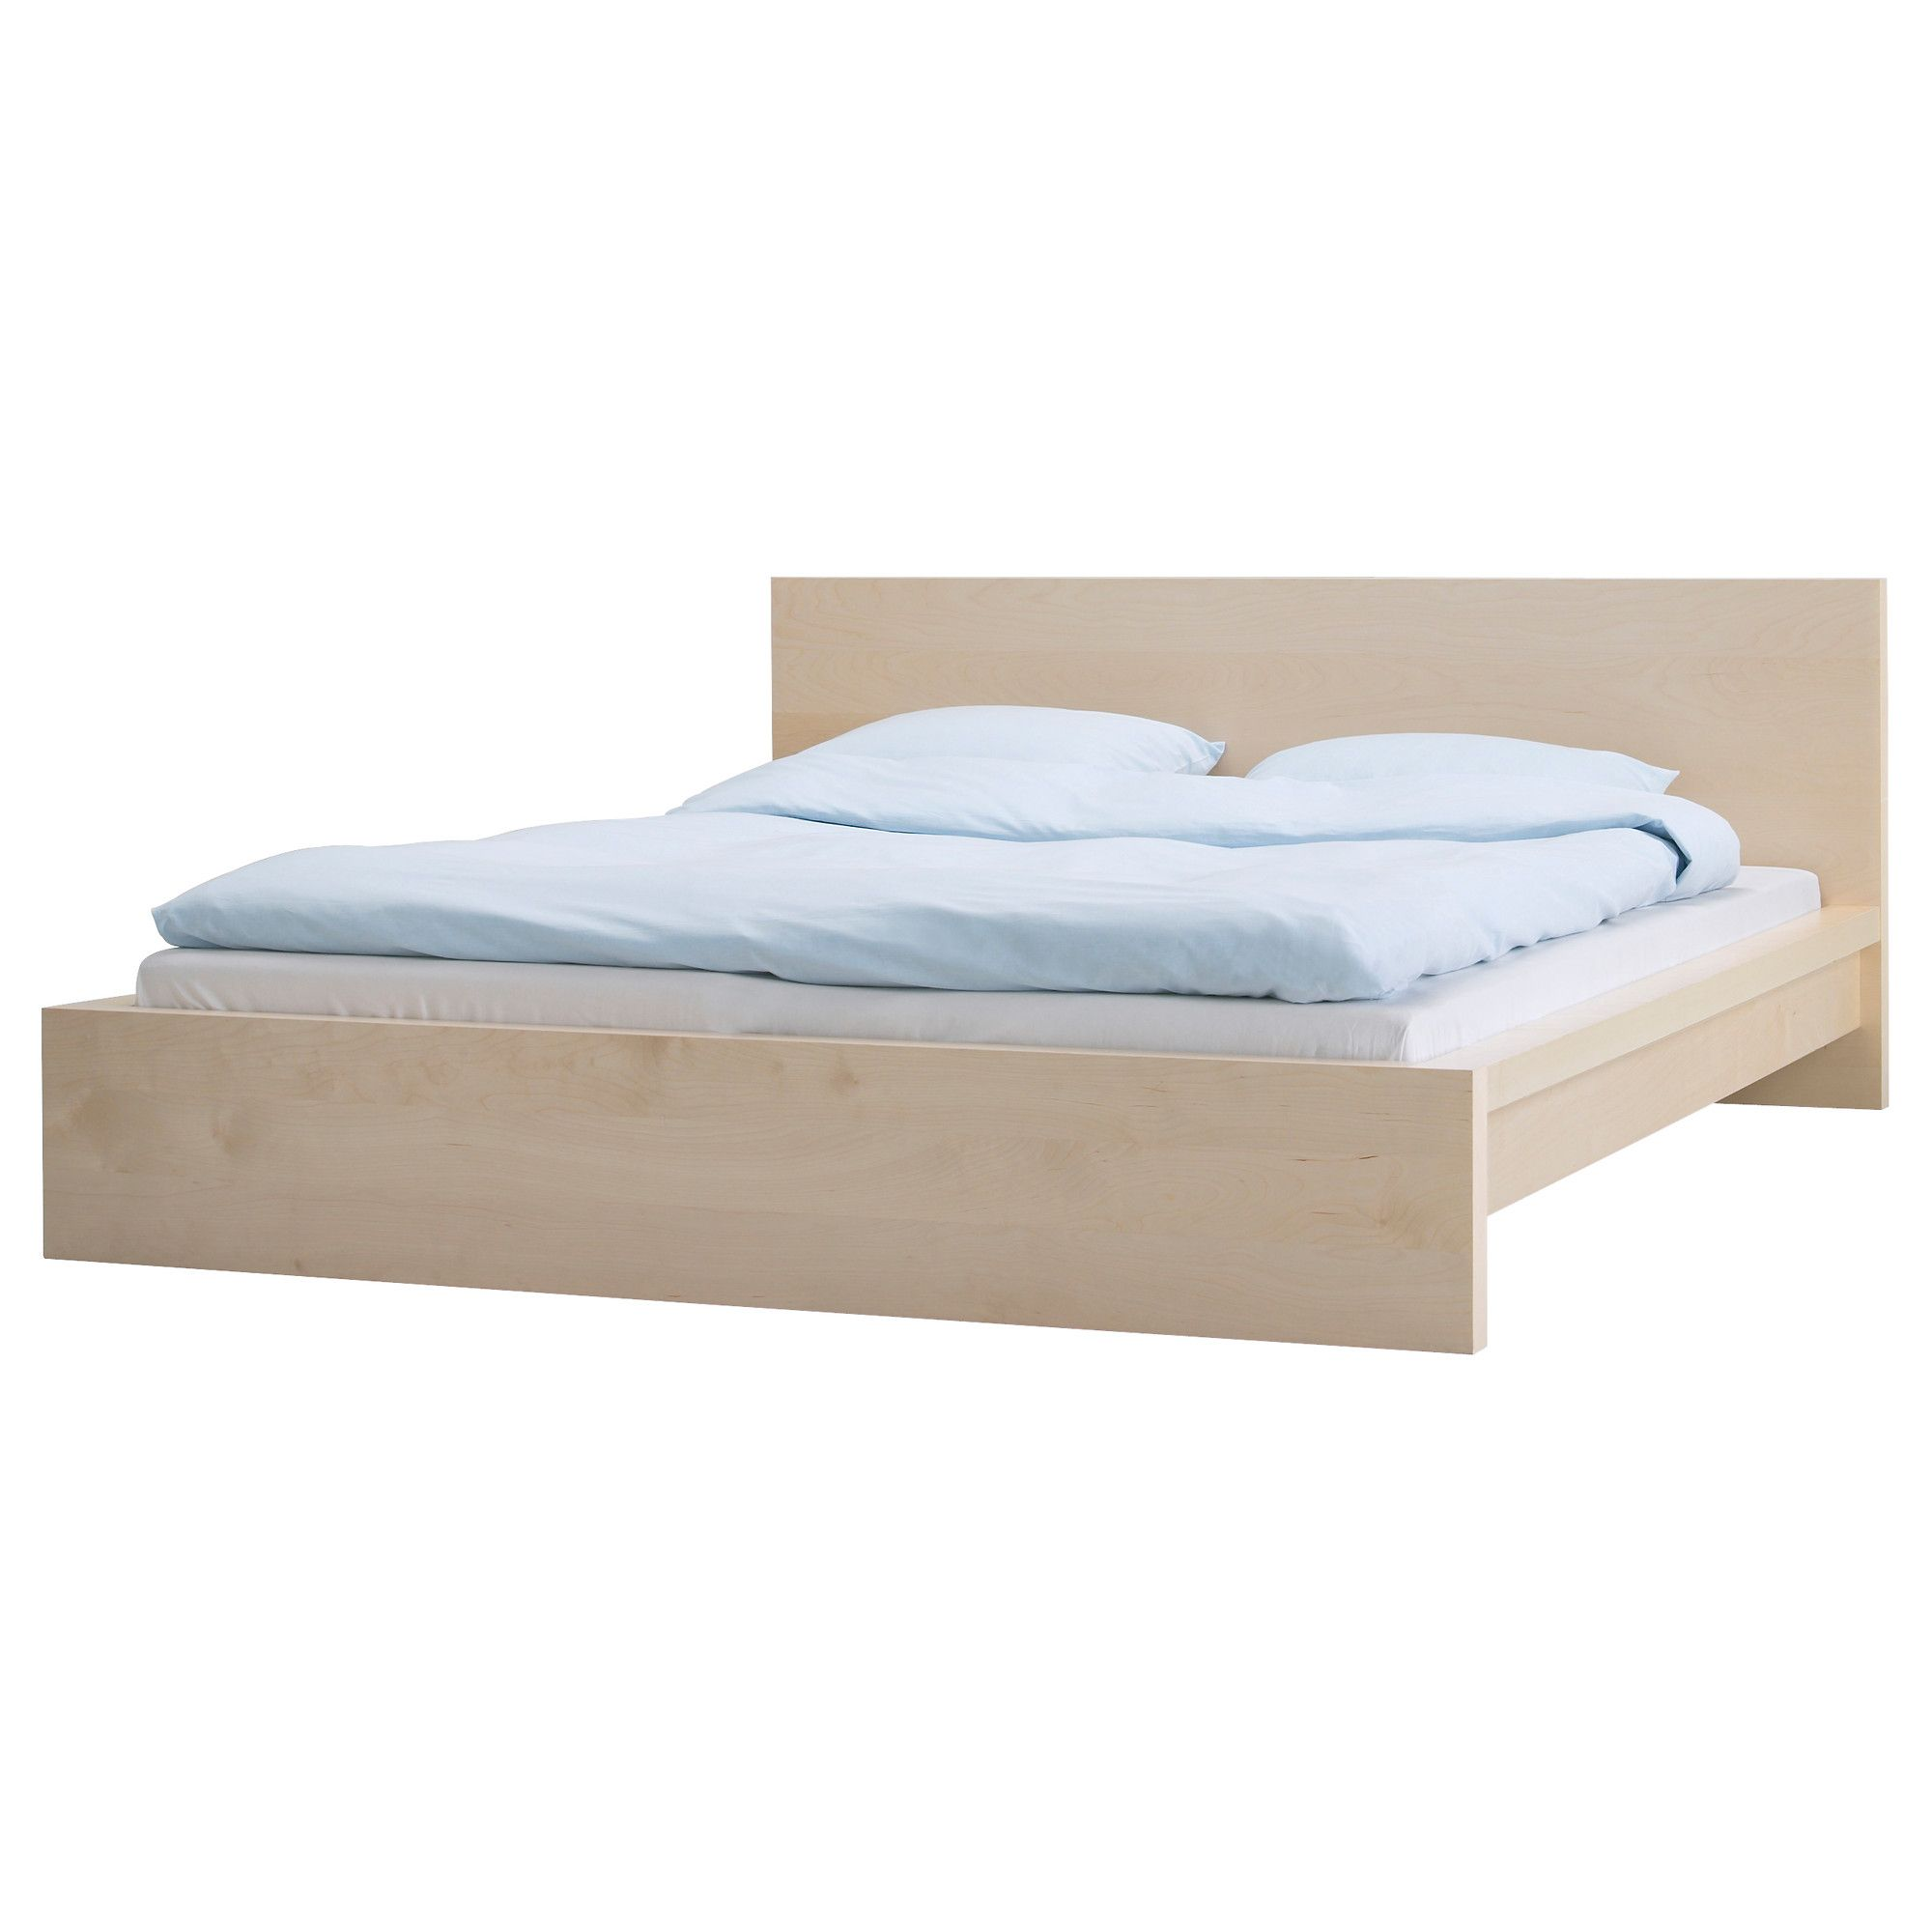 Ikea Us Furniture And Home Furnishings Malm Bed Malm Bed